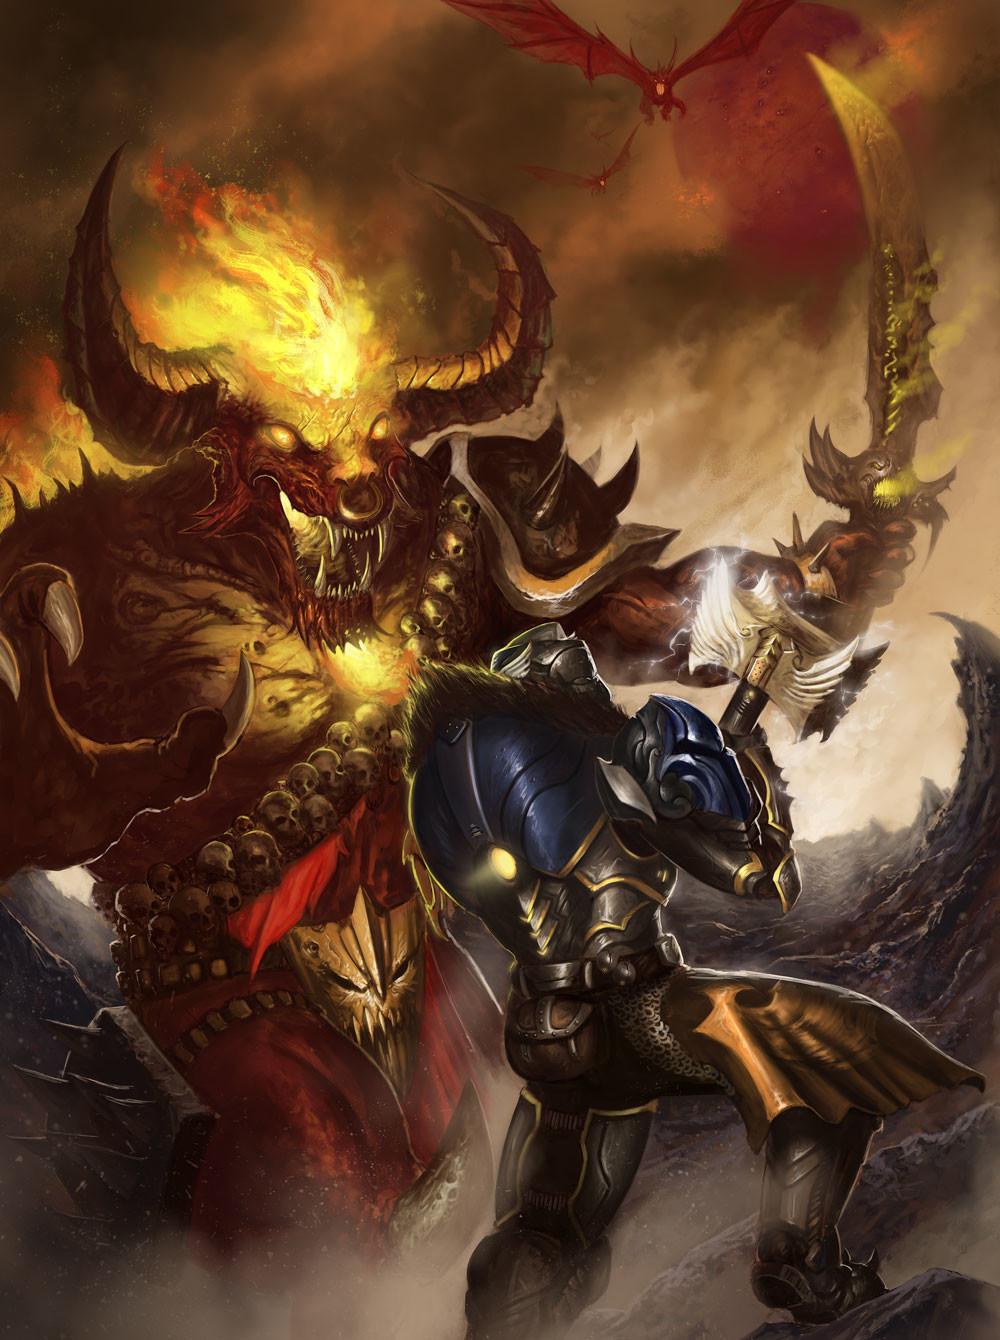 Michael rookard alexandros v blackmetallord f1